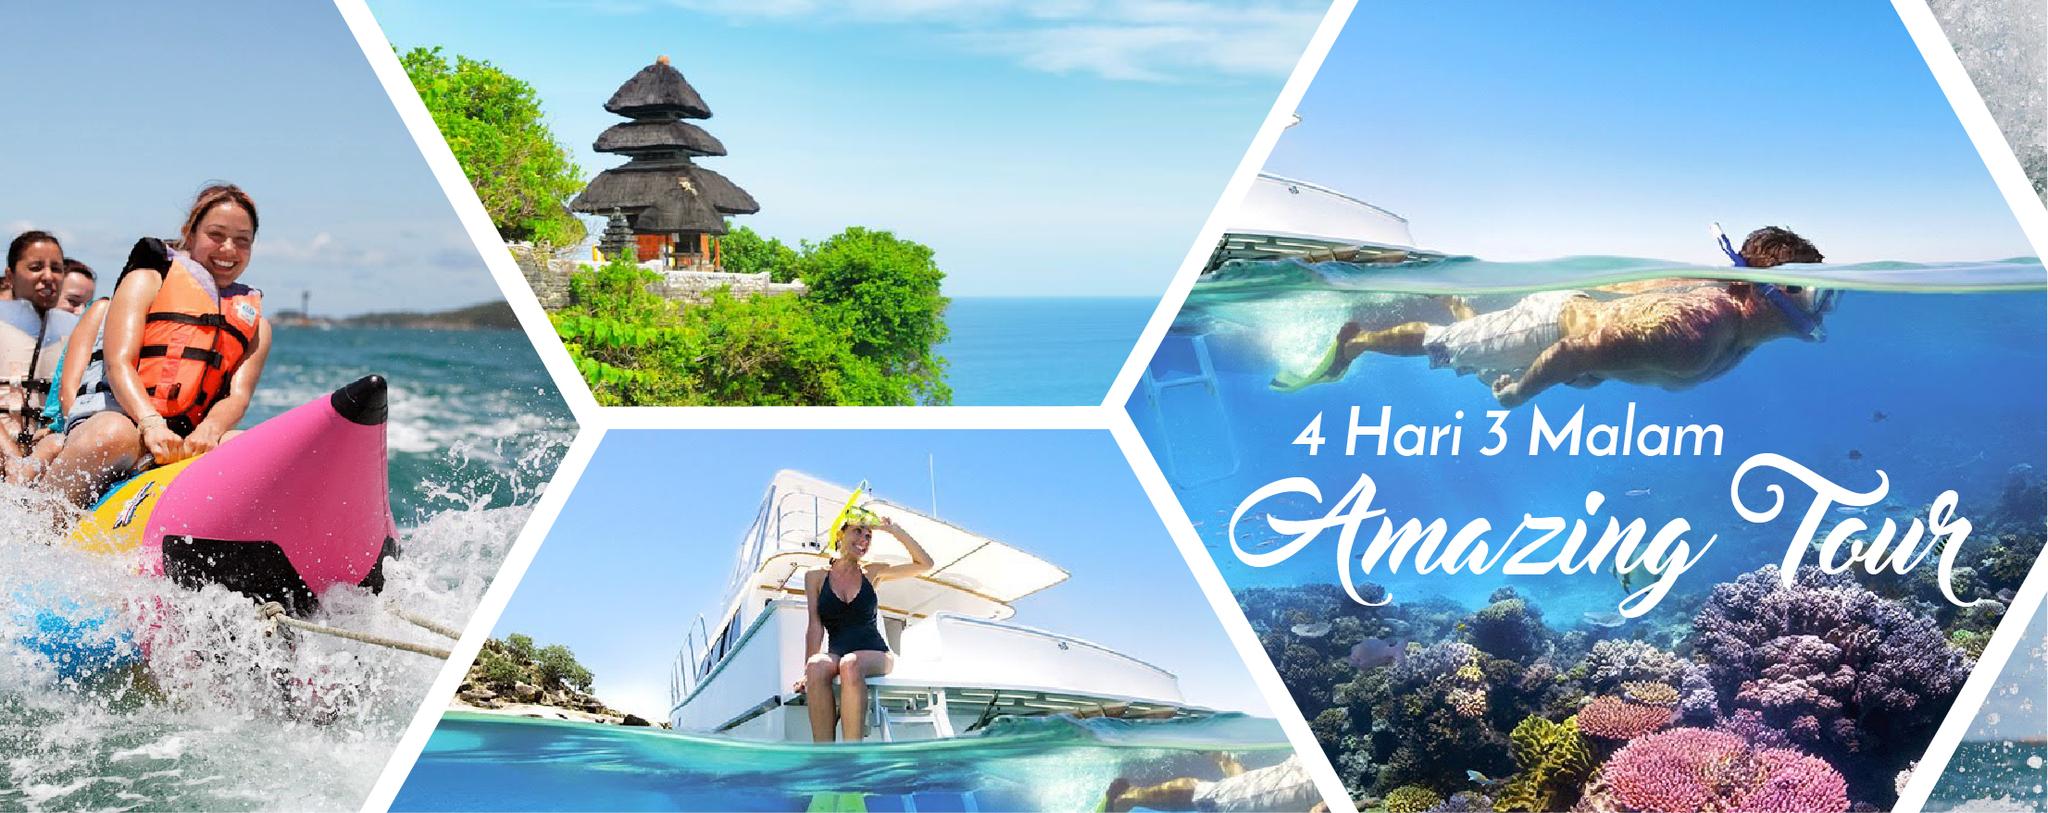 Jual Paket Tour Bali Rama Tokopedia 4 Hari 3 Malam